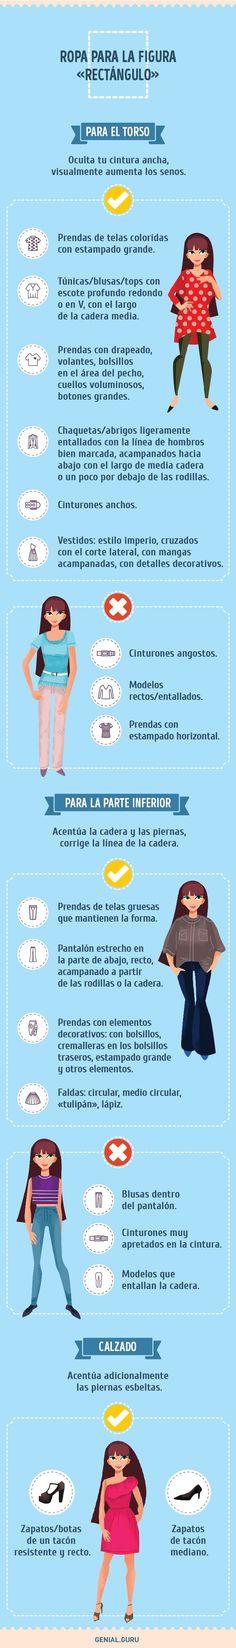 How to dress rectangle body shape Body Positivity, Fashion Looks, Fashion Tips, Fashion Design, Women's Fashion, Fasion, Personal Image, Body Top, Rectangle Shape